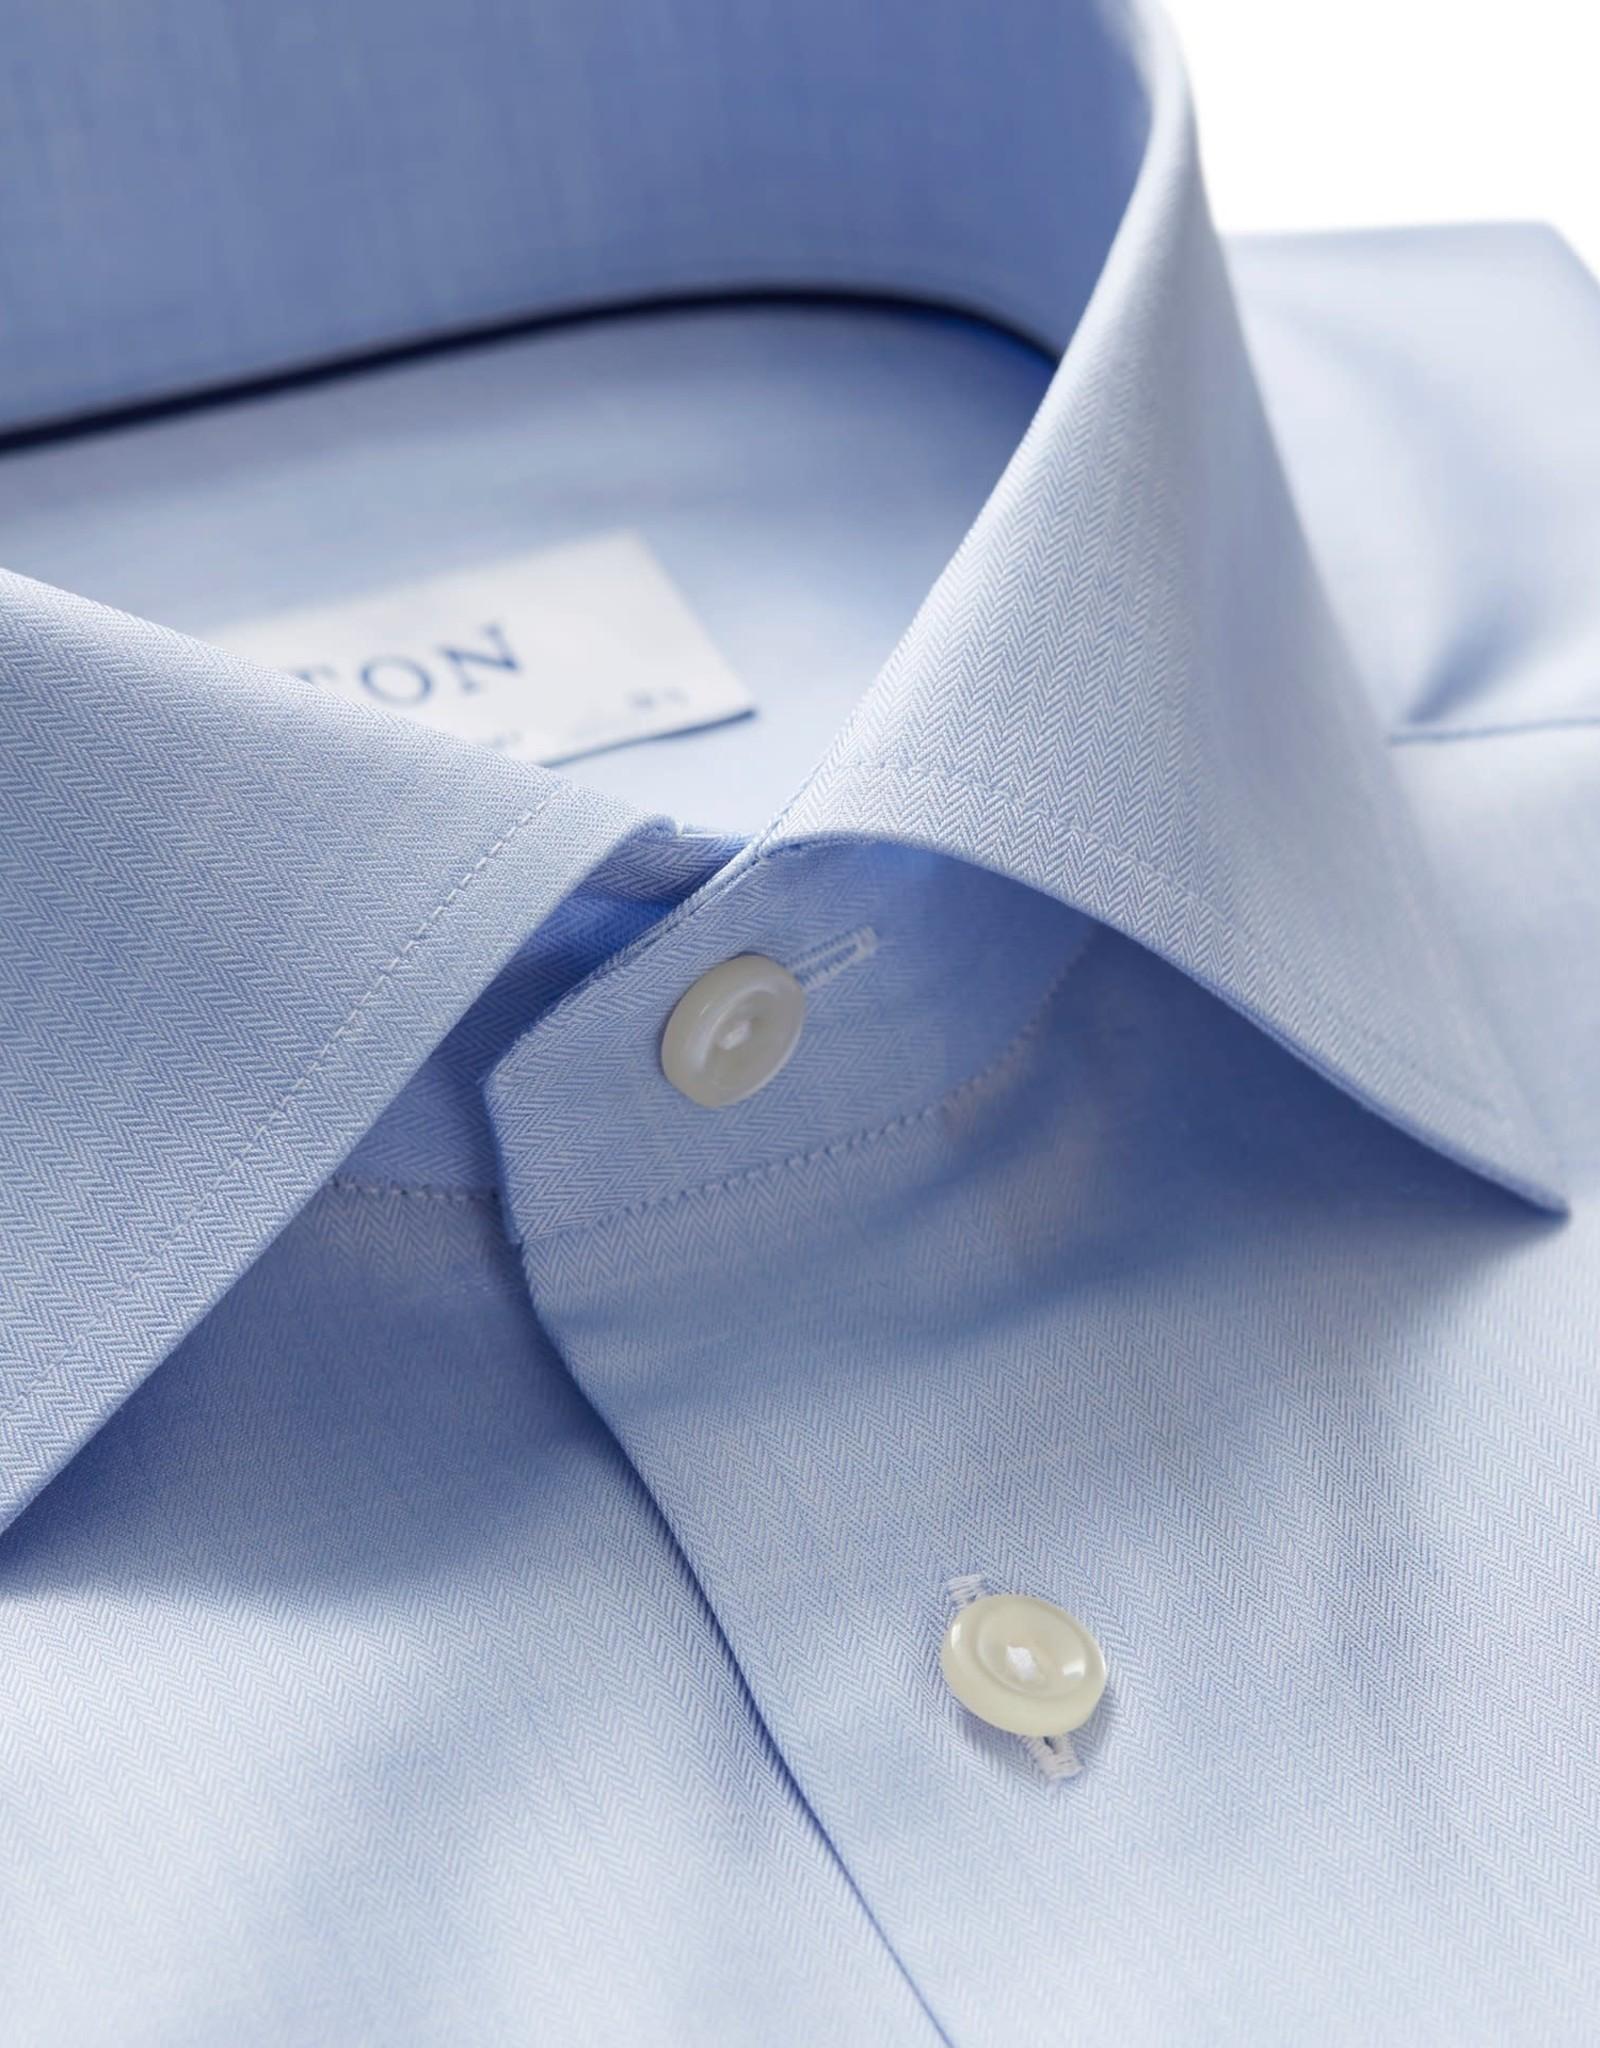 Eton Eton hemd blauw slim 3072-79511/20